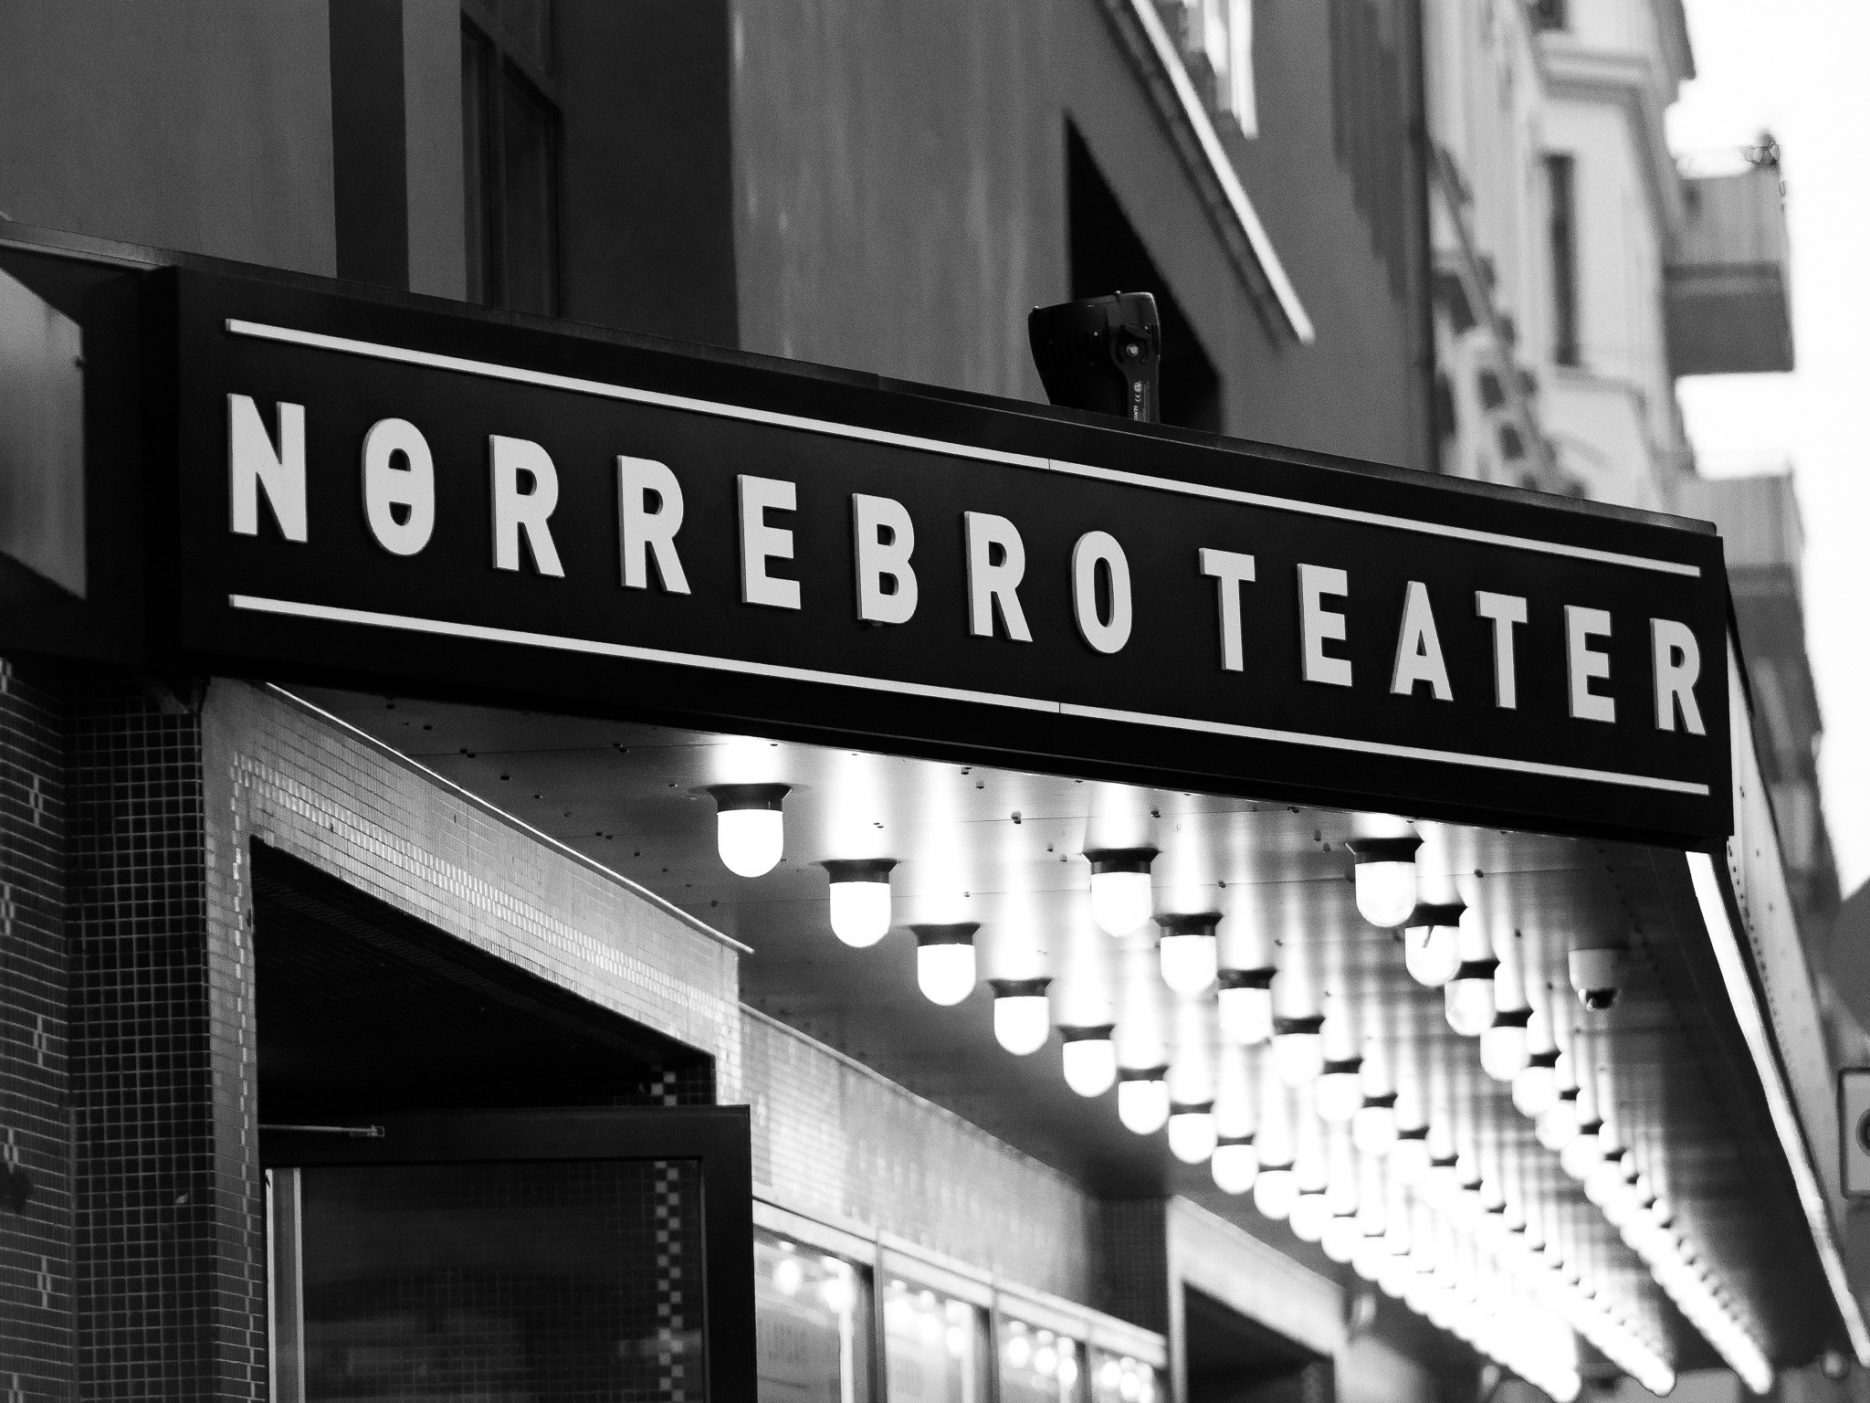 Nørrebro teater - dagens venue